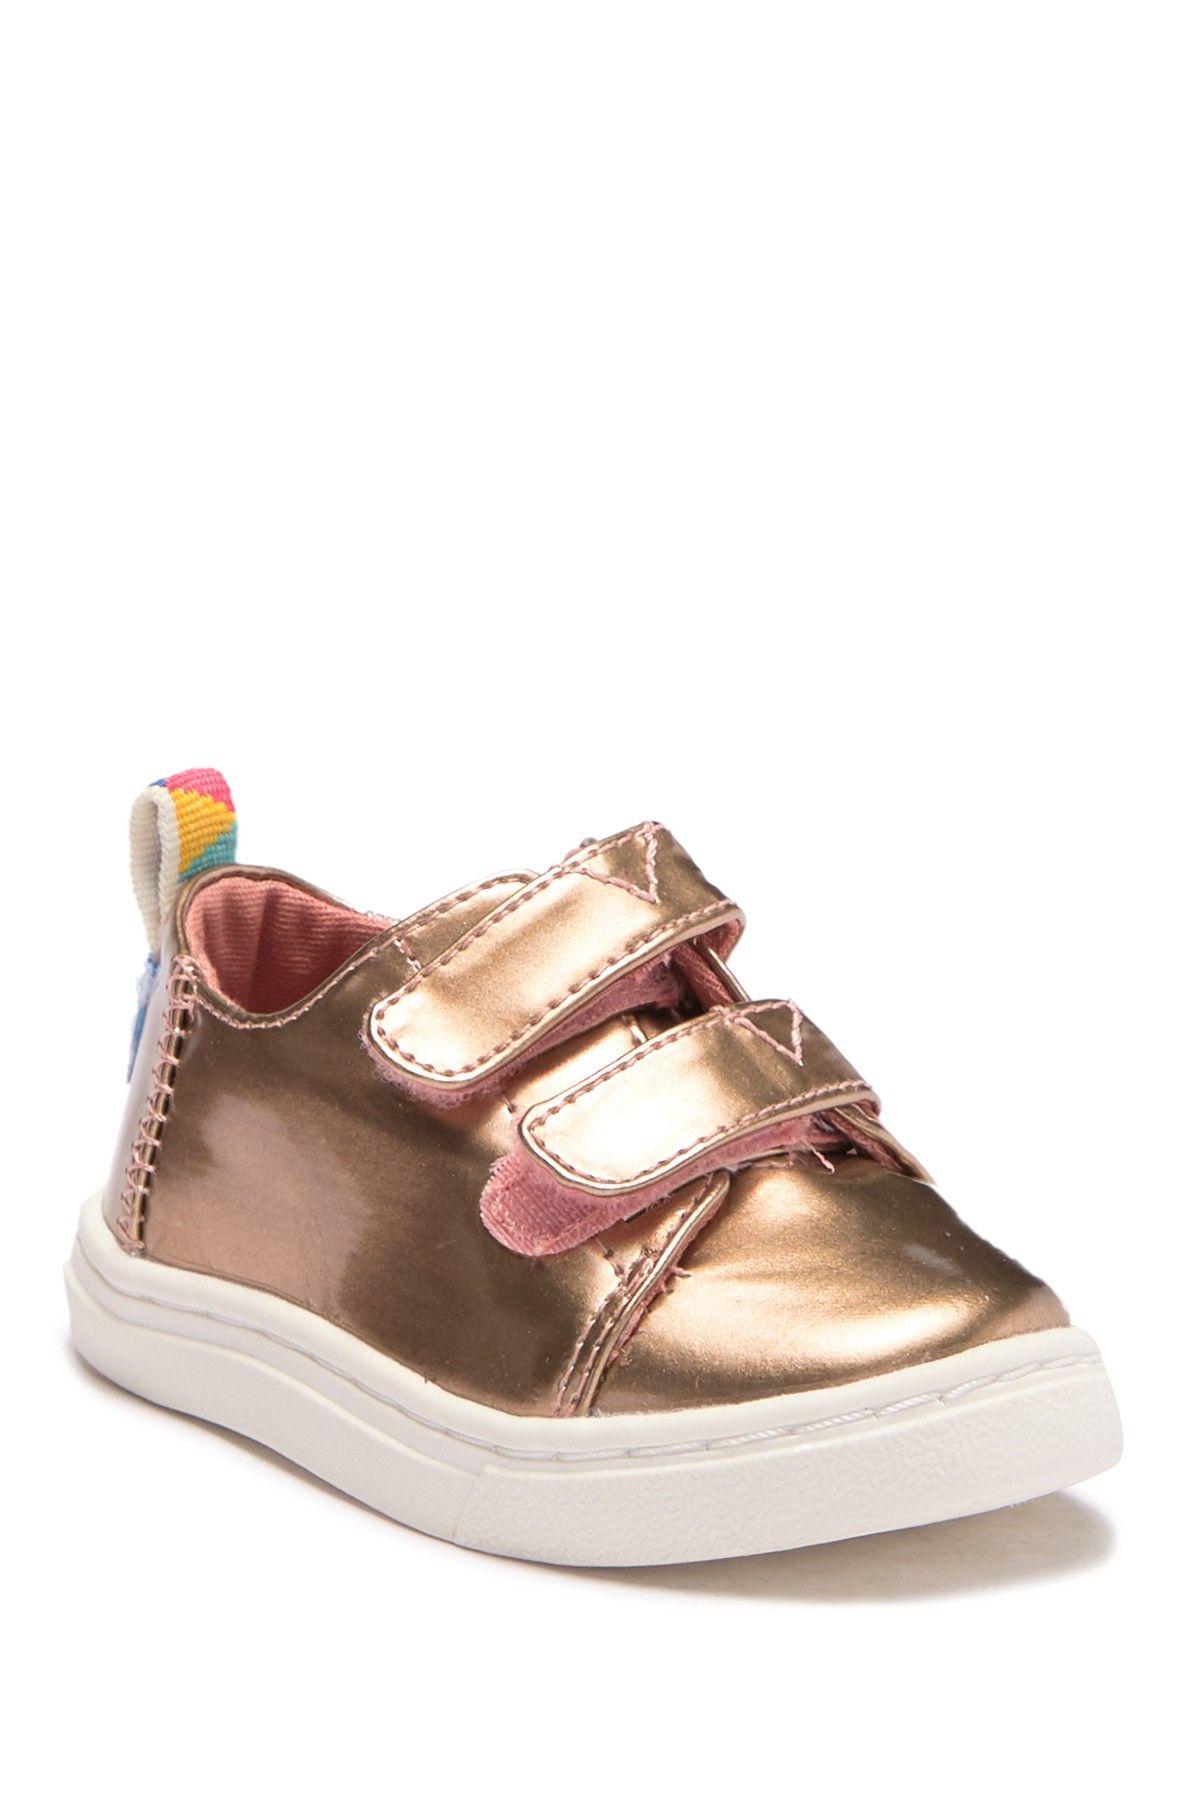 TOMS   Lenny Sneaker (Baby, Toddler